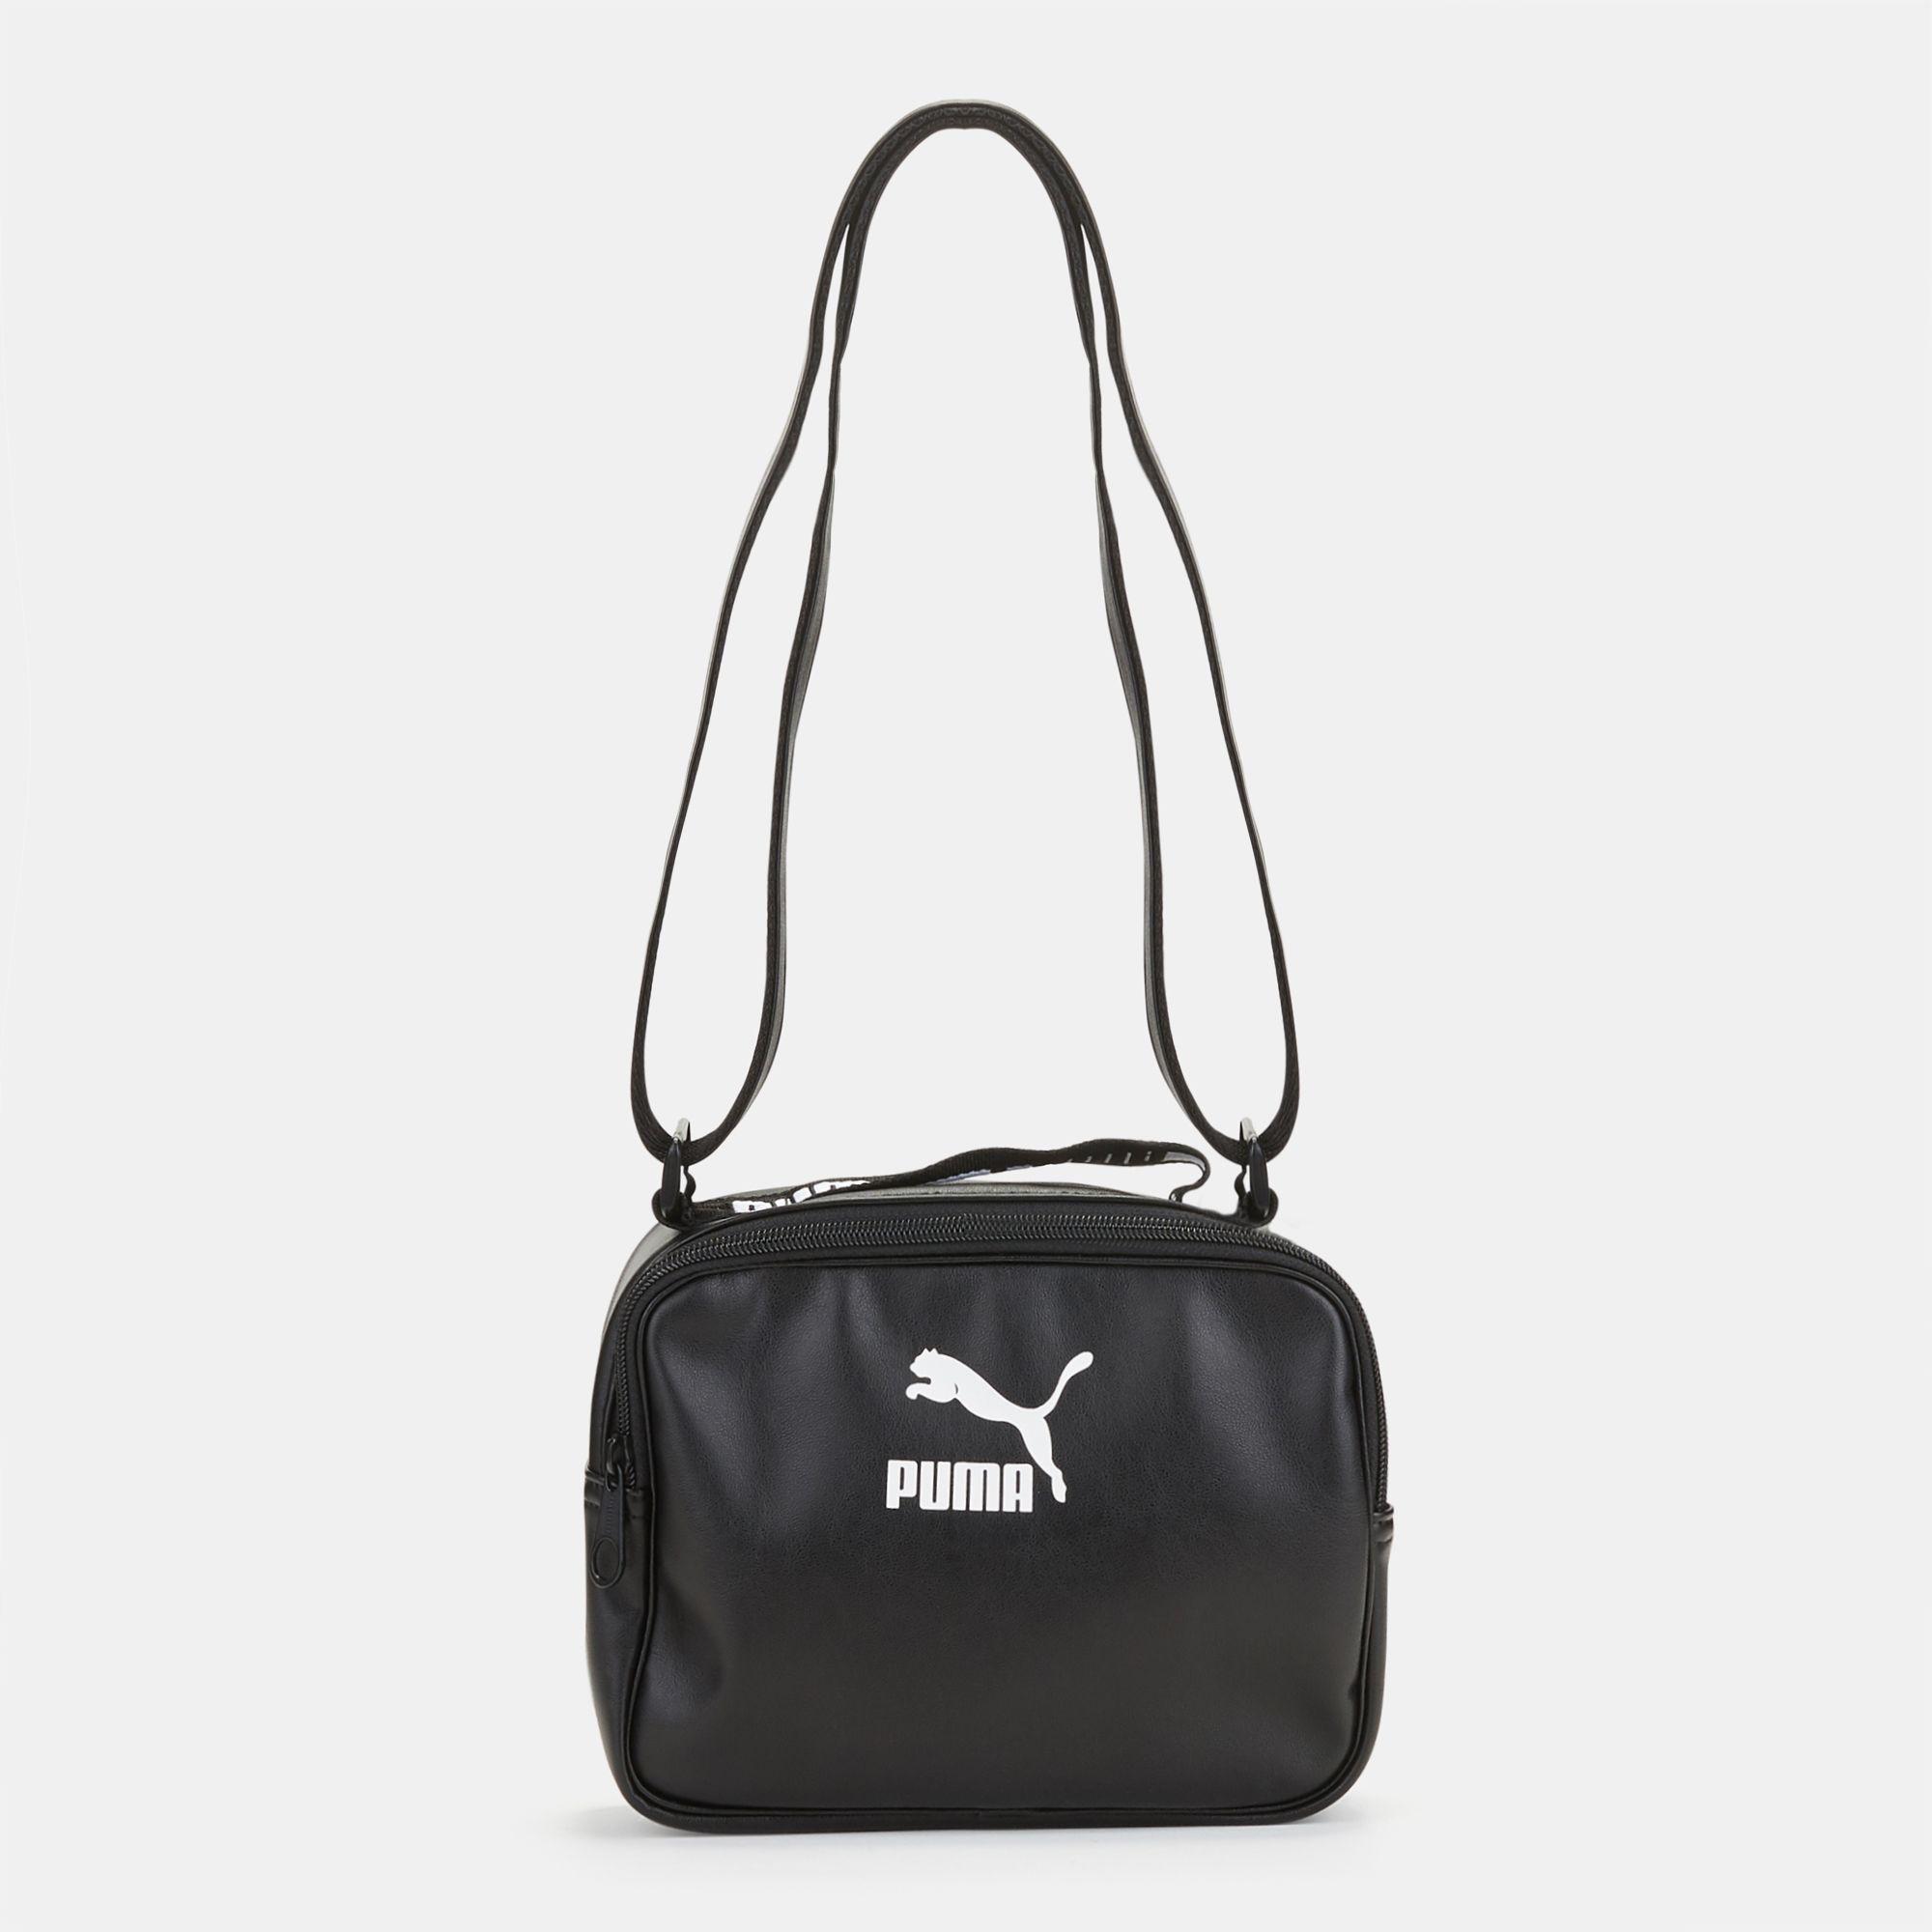 PUMA Prime Mini Reporter Bag